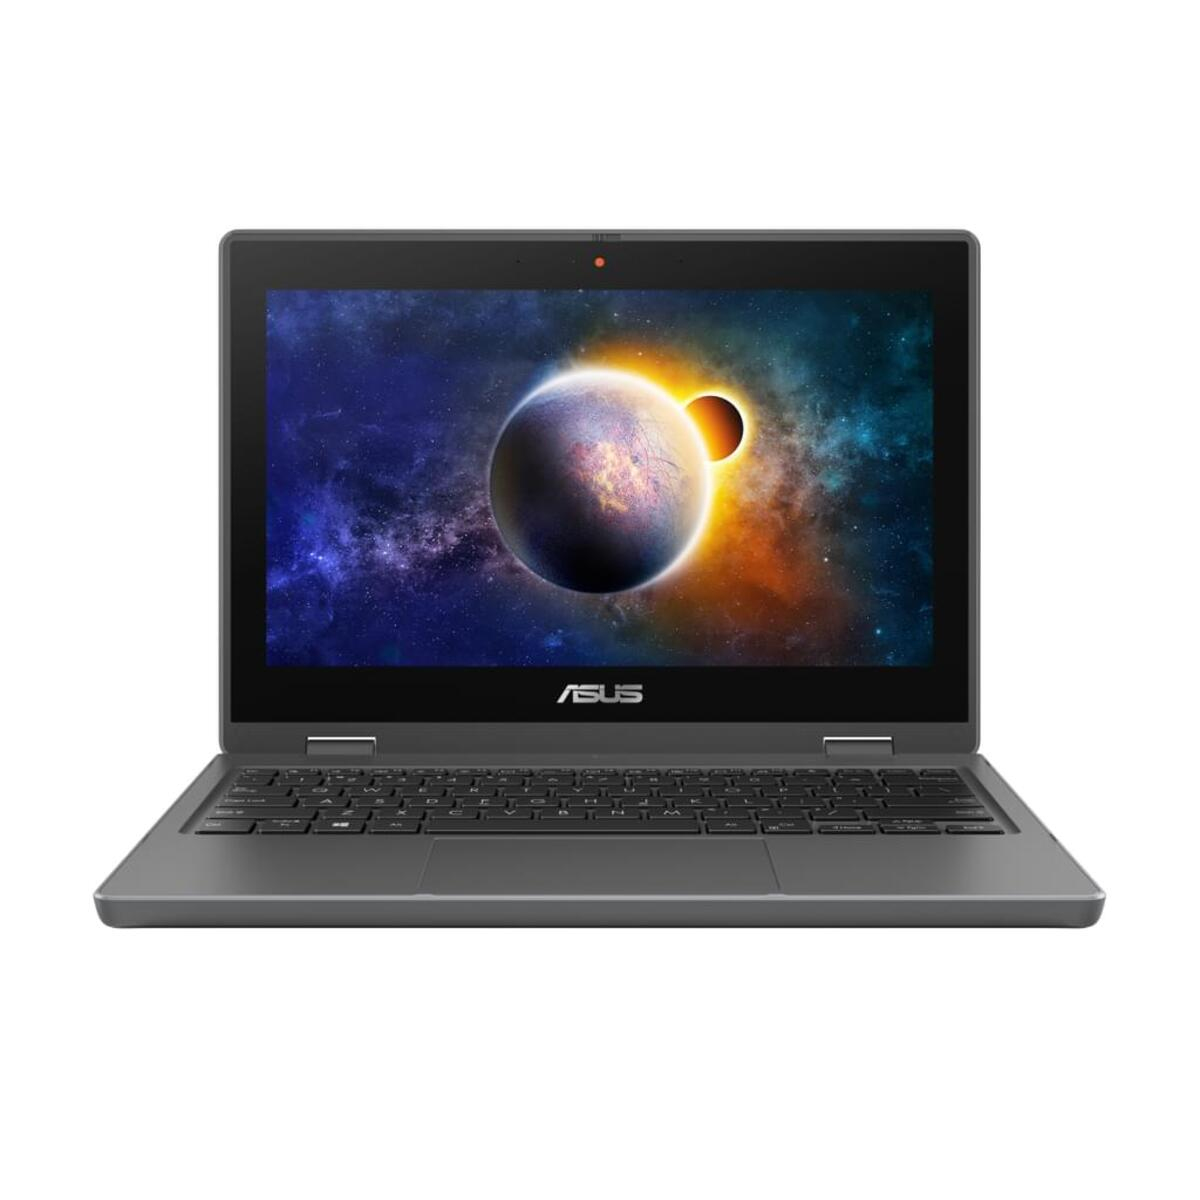 "Bild 1 von ASUS BR1100FKA BP0170RA - Flip-Design - Pentium Silver N6000 / 1.1 GHz - Windows 10 Pro National Academic - 4 GB RAM - 128 GB eMMC - 29.5 cm (11.6"")"